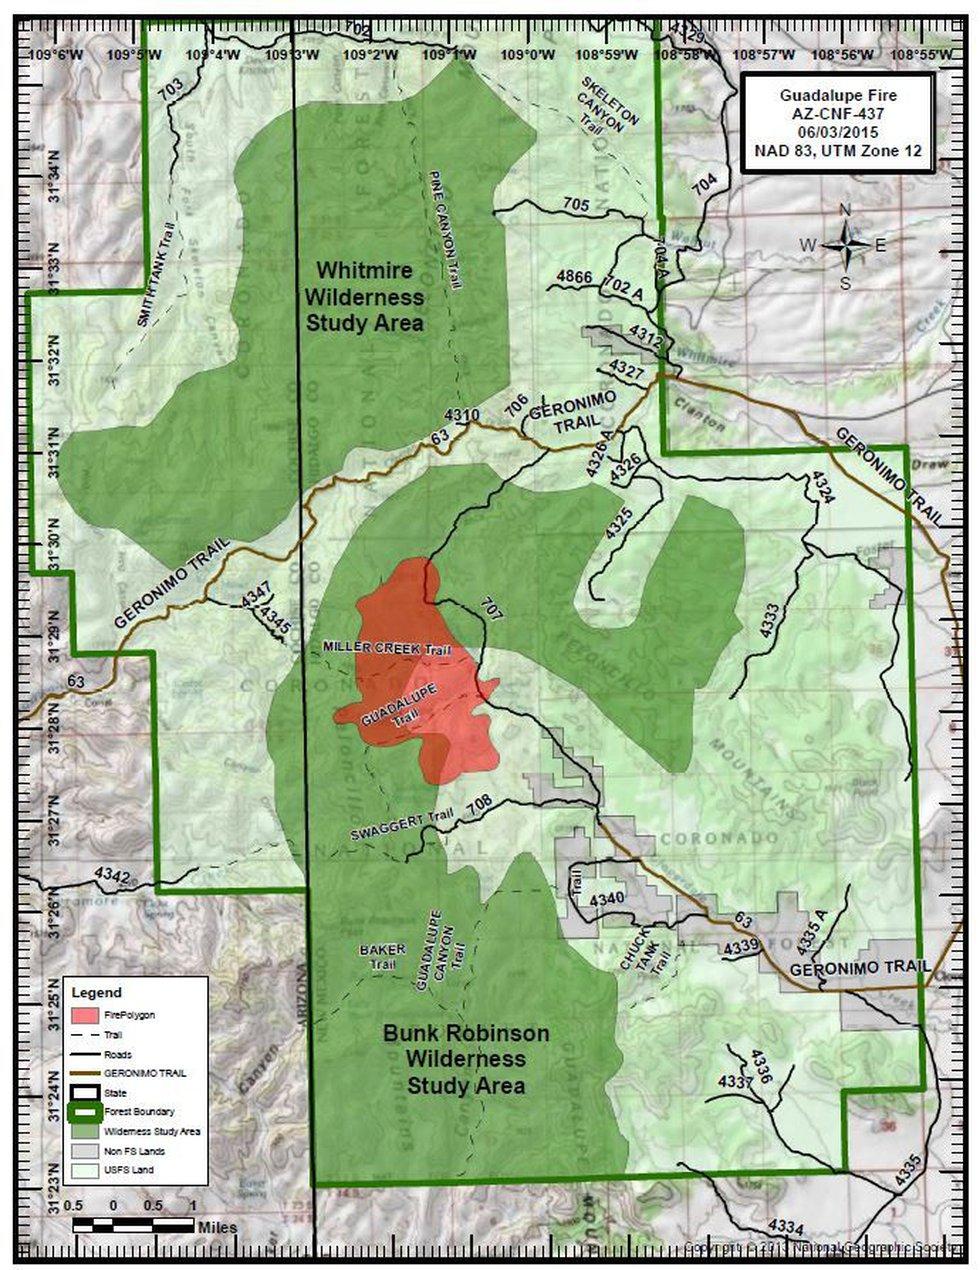 Guadalupe fire (Source: U.S. Forest Service)